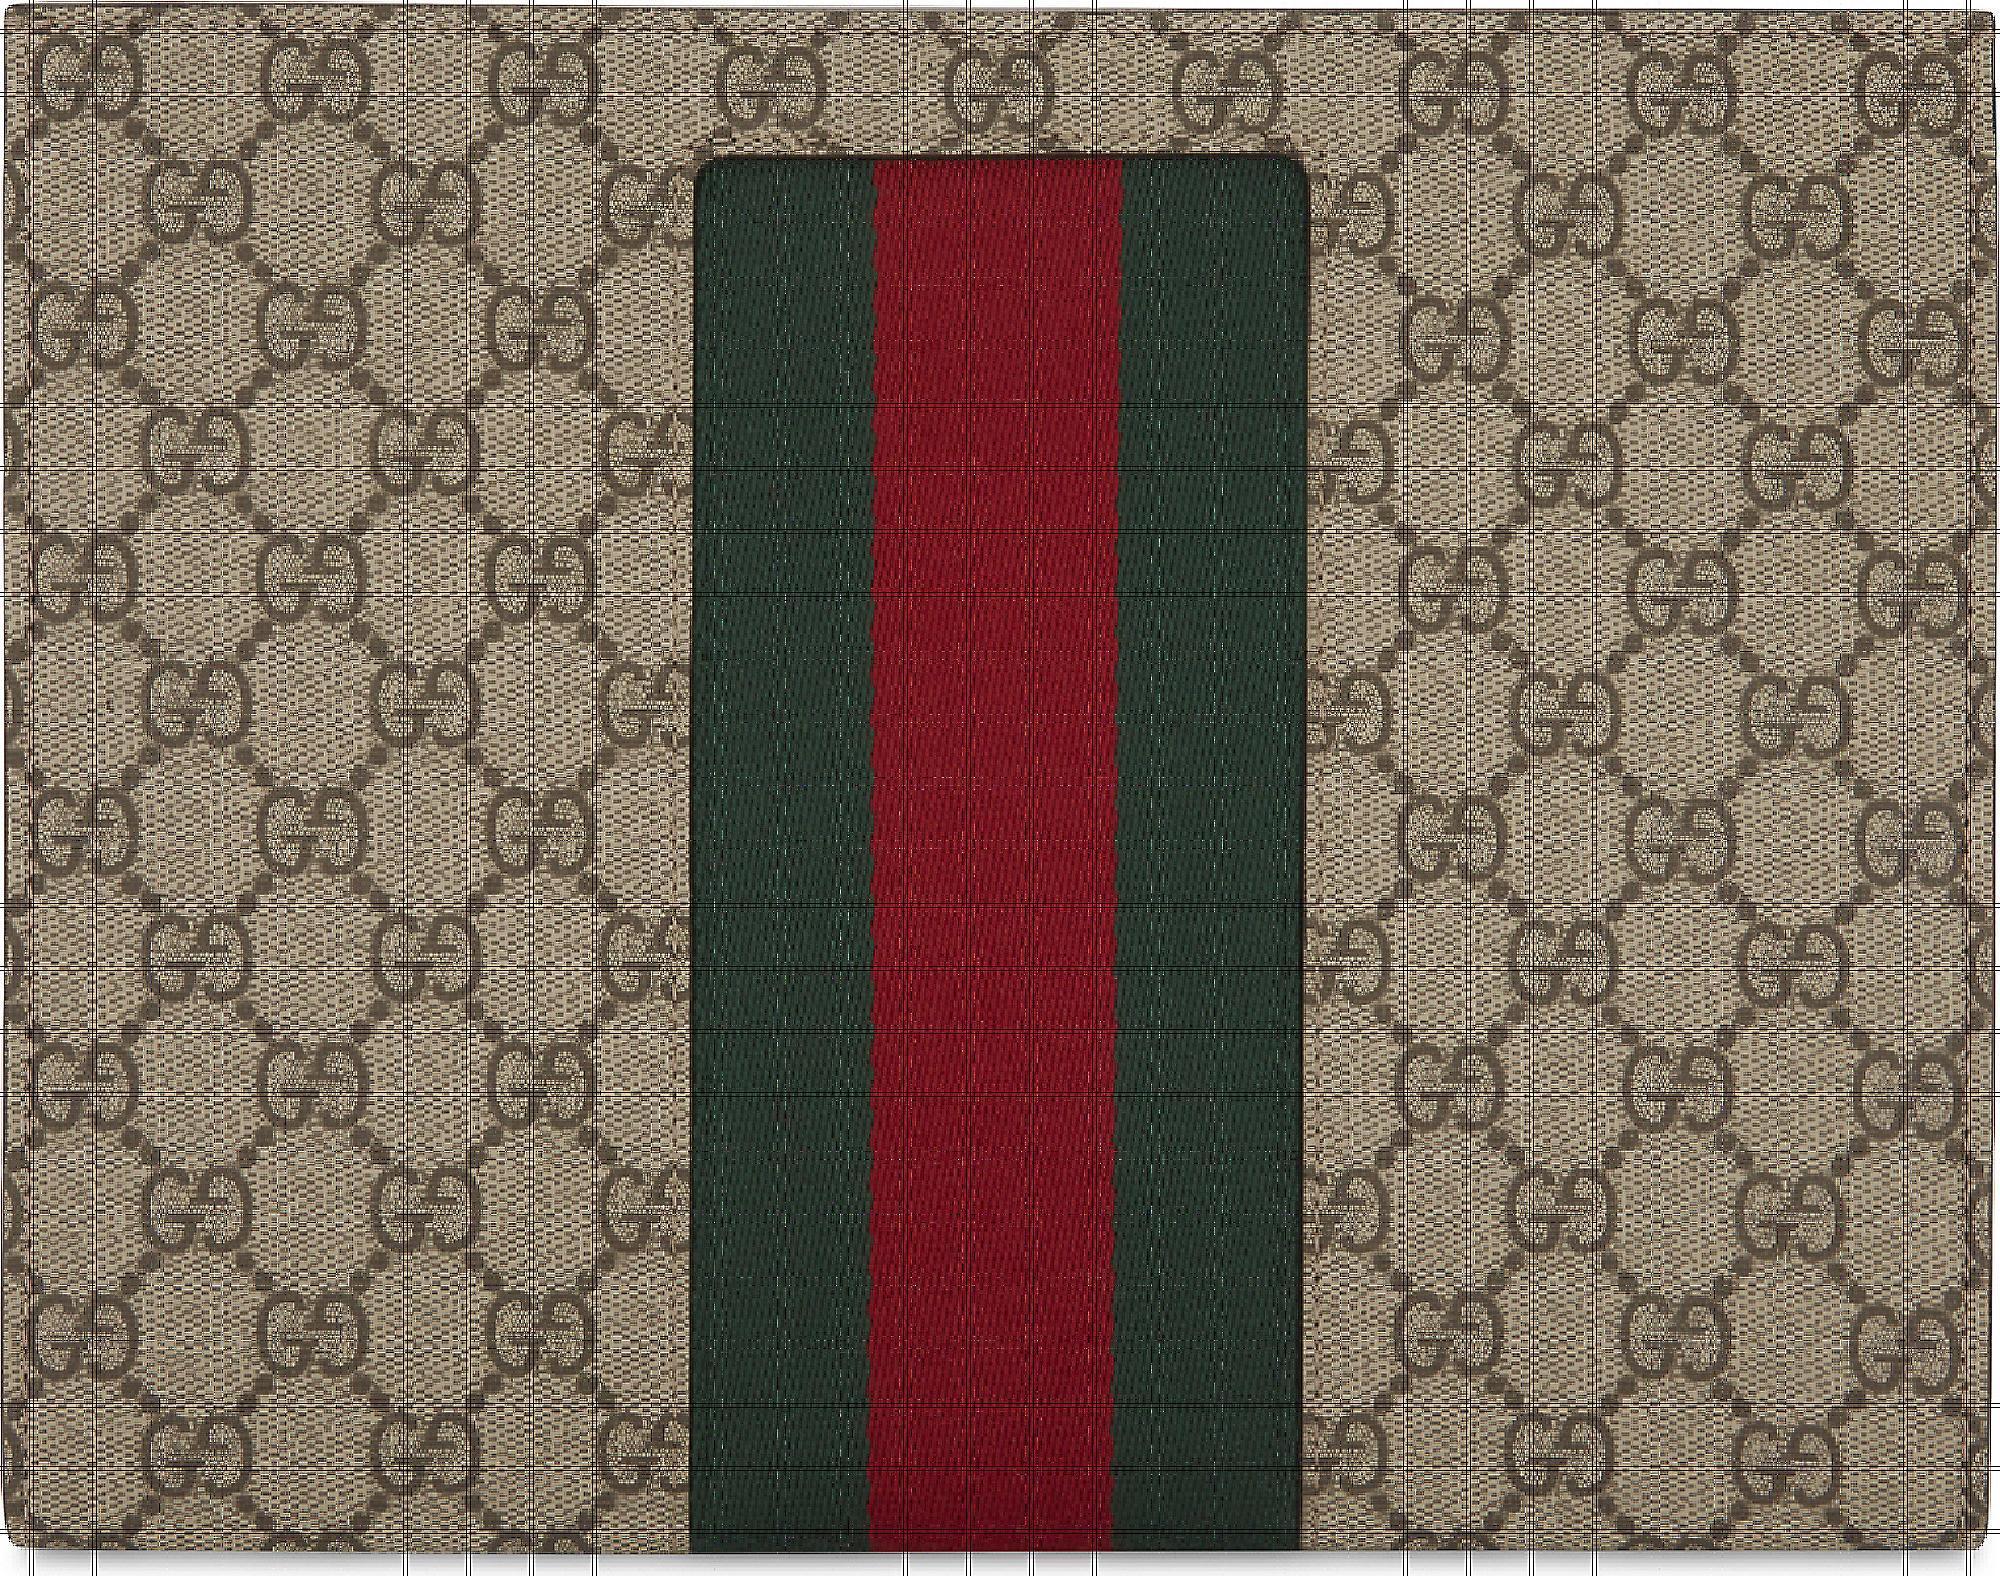 3695c7ebac0 Lyst - Gucci Web Stripe Gg Supreme Wash Bag for Men